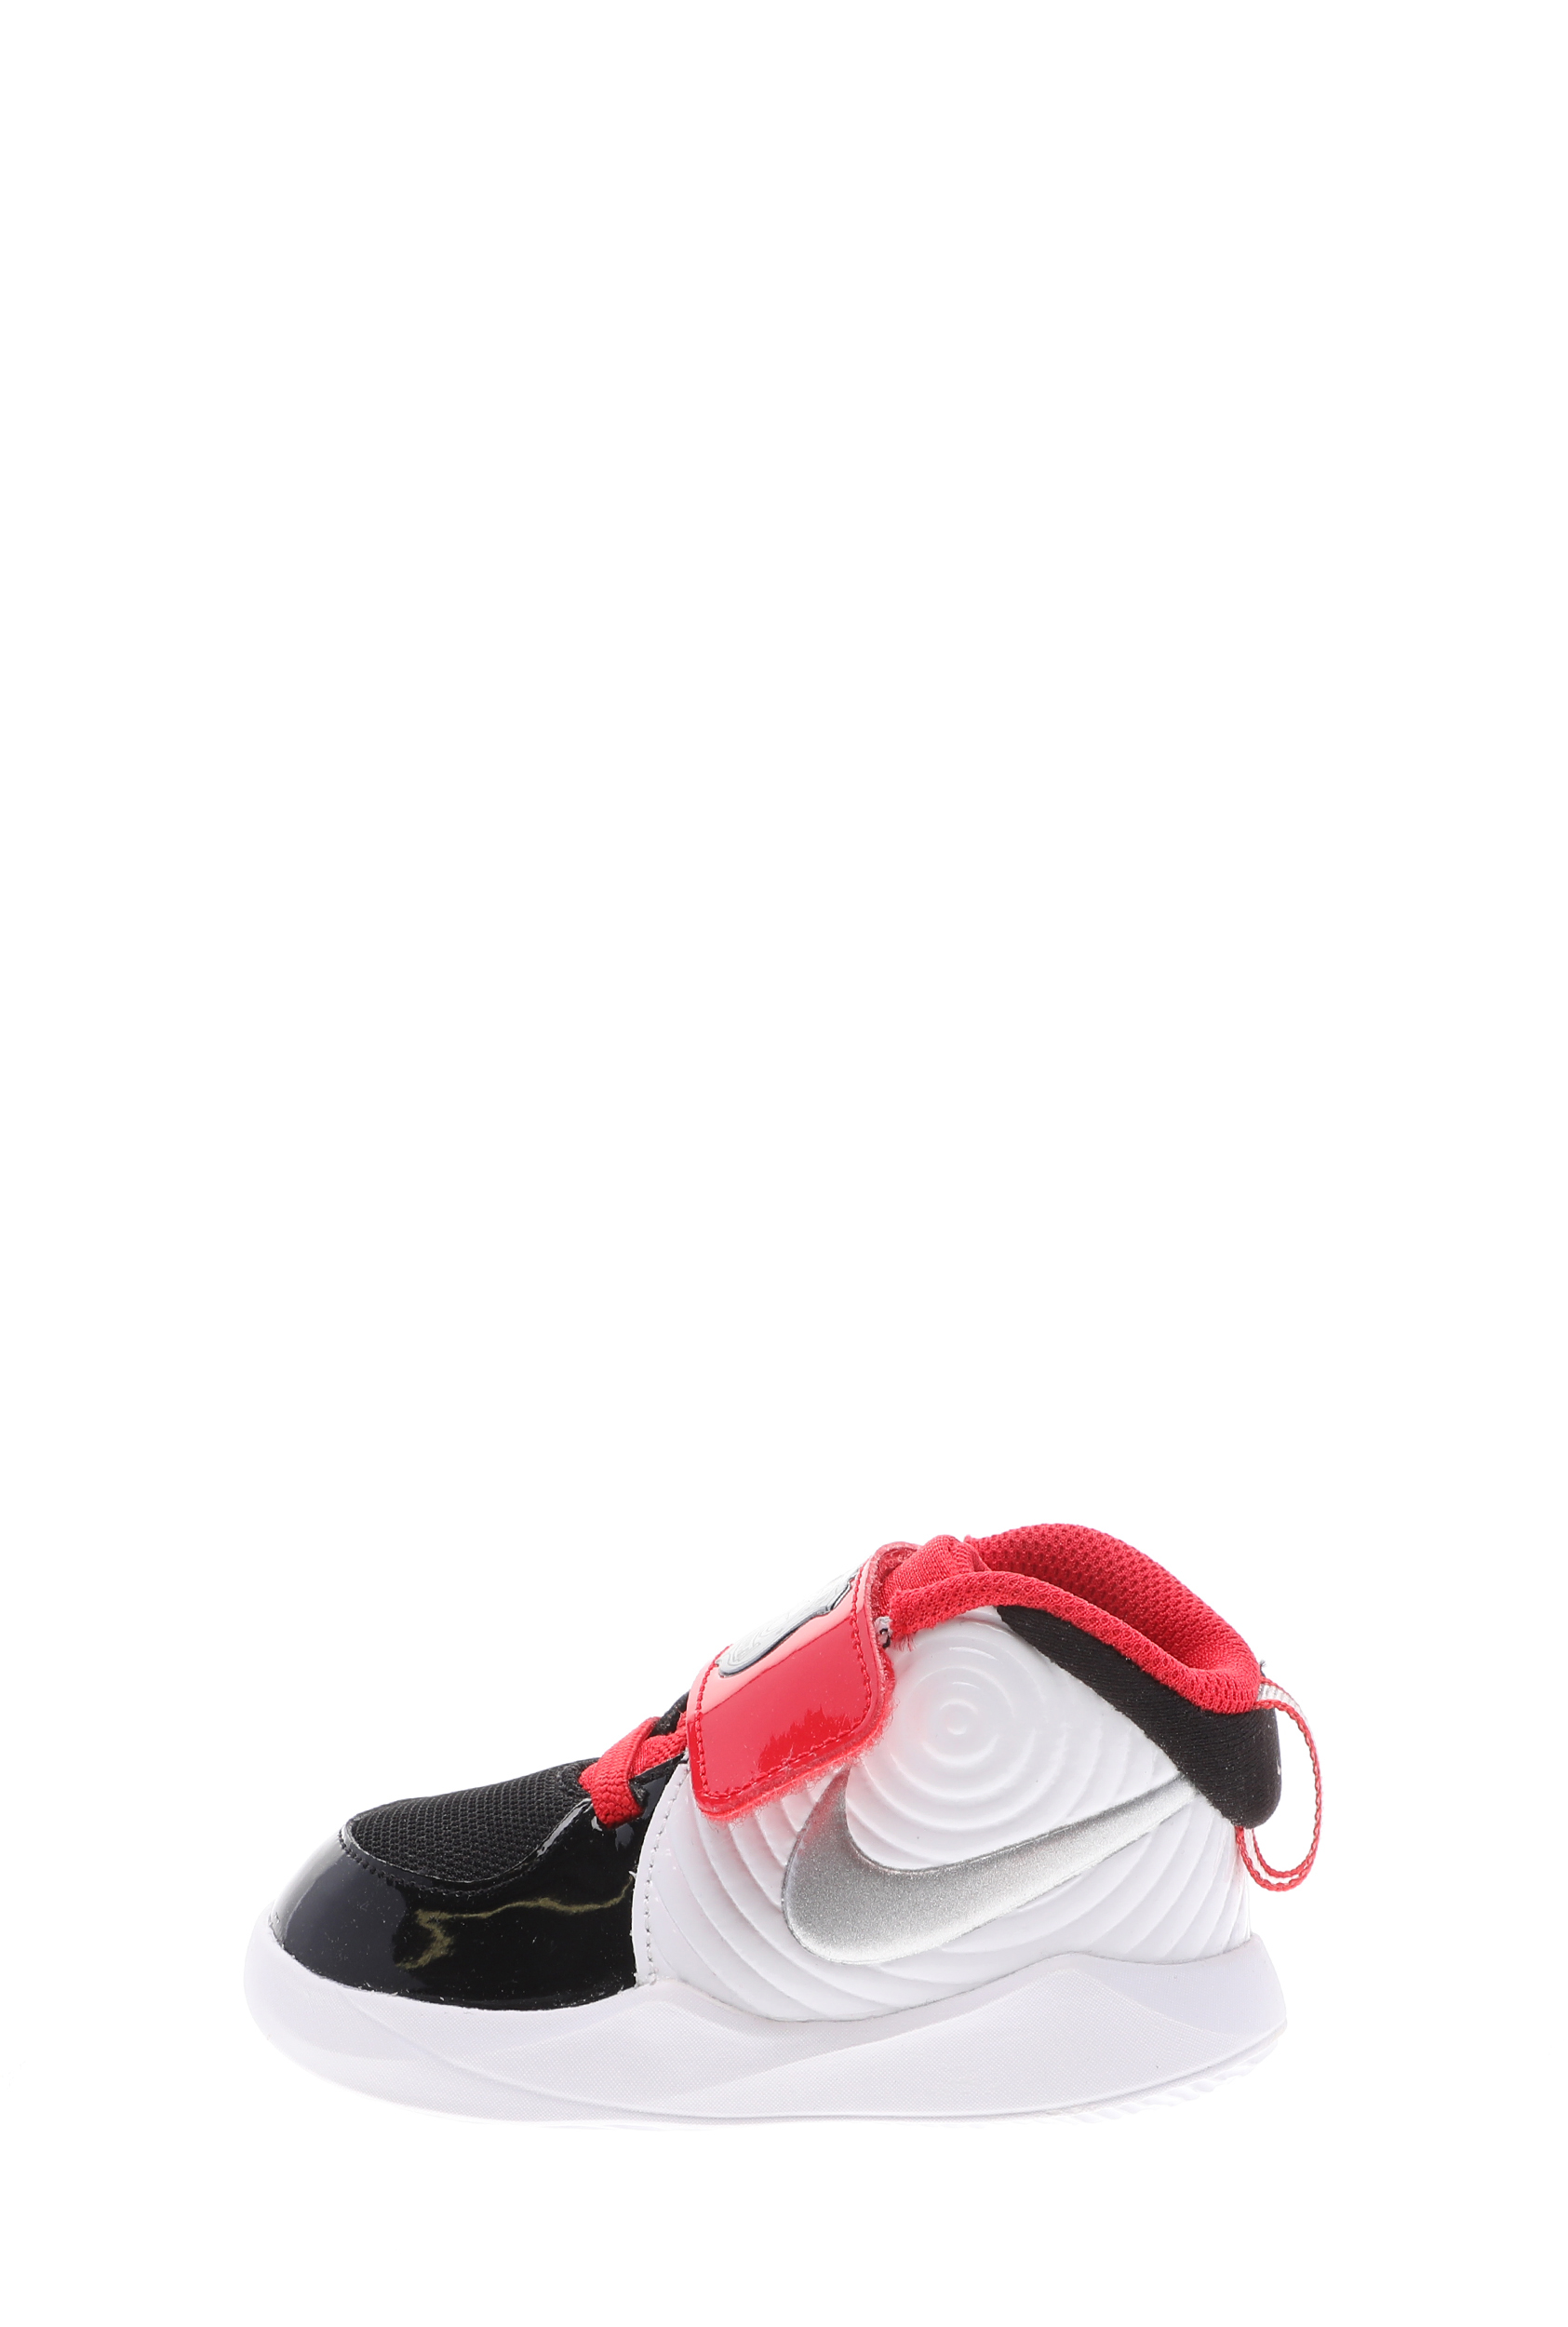 NIKE – Βρεφικά αθλητικά παπούτσια NIKE TEAM HUSTLE D 9 (TD) AUTO λευκά μαύρα